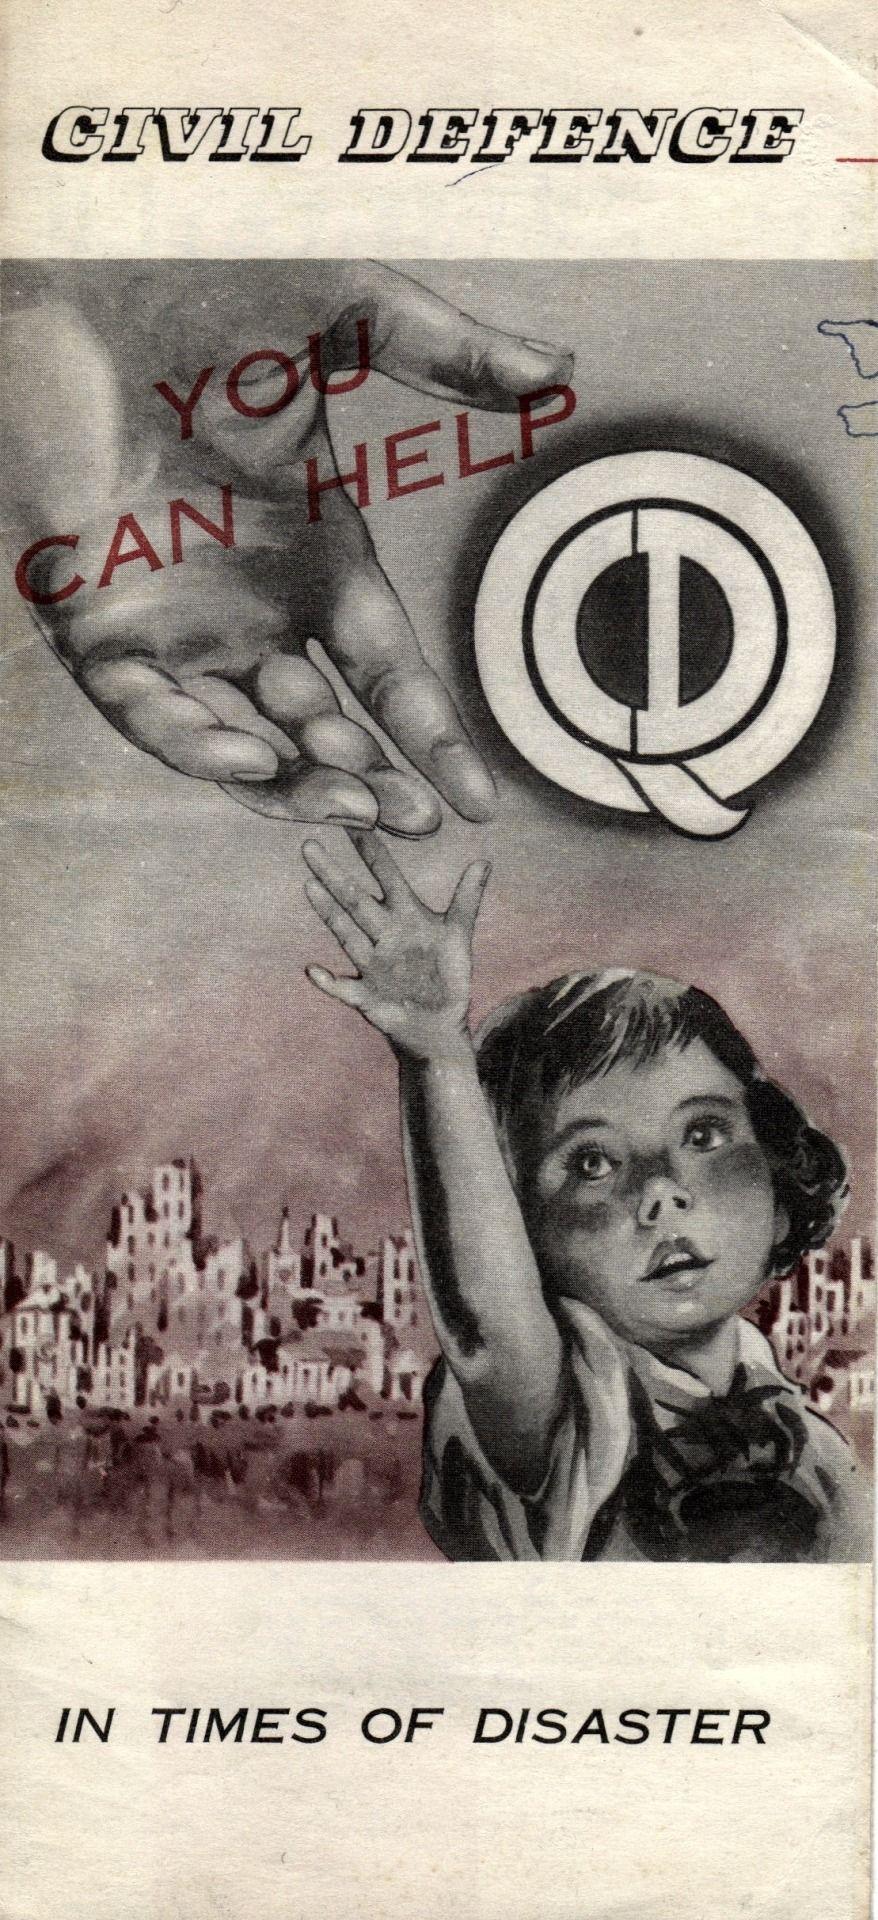 C I V I L D E F E N C E Photo Nihilism, Civil defense